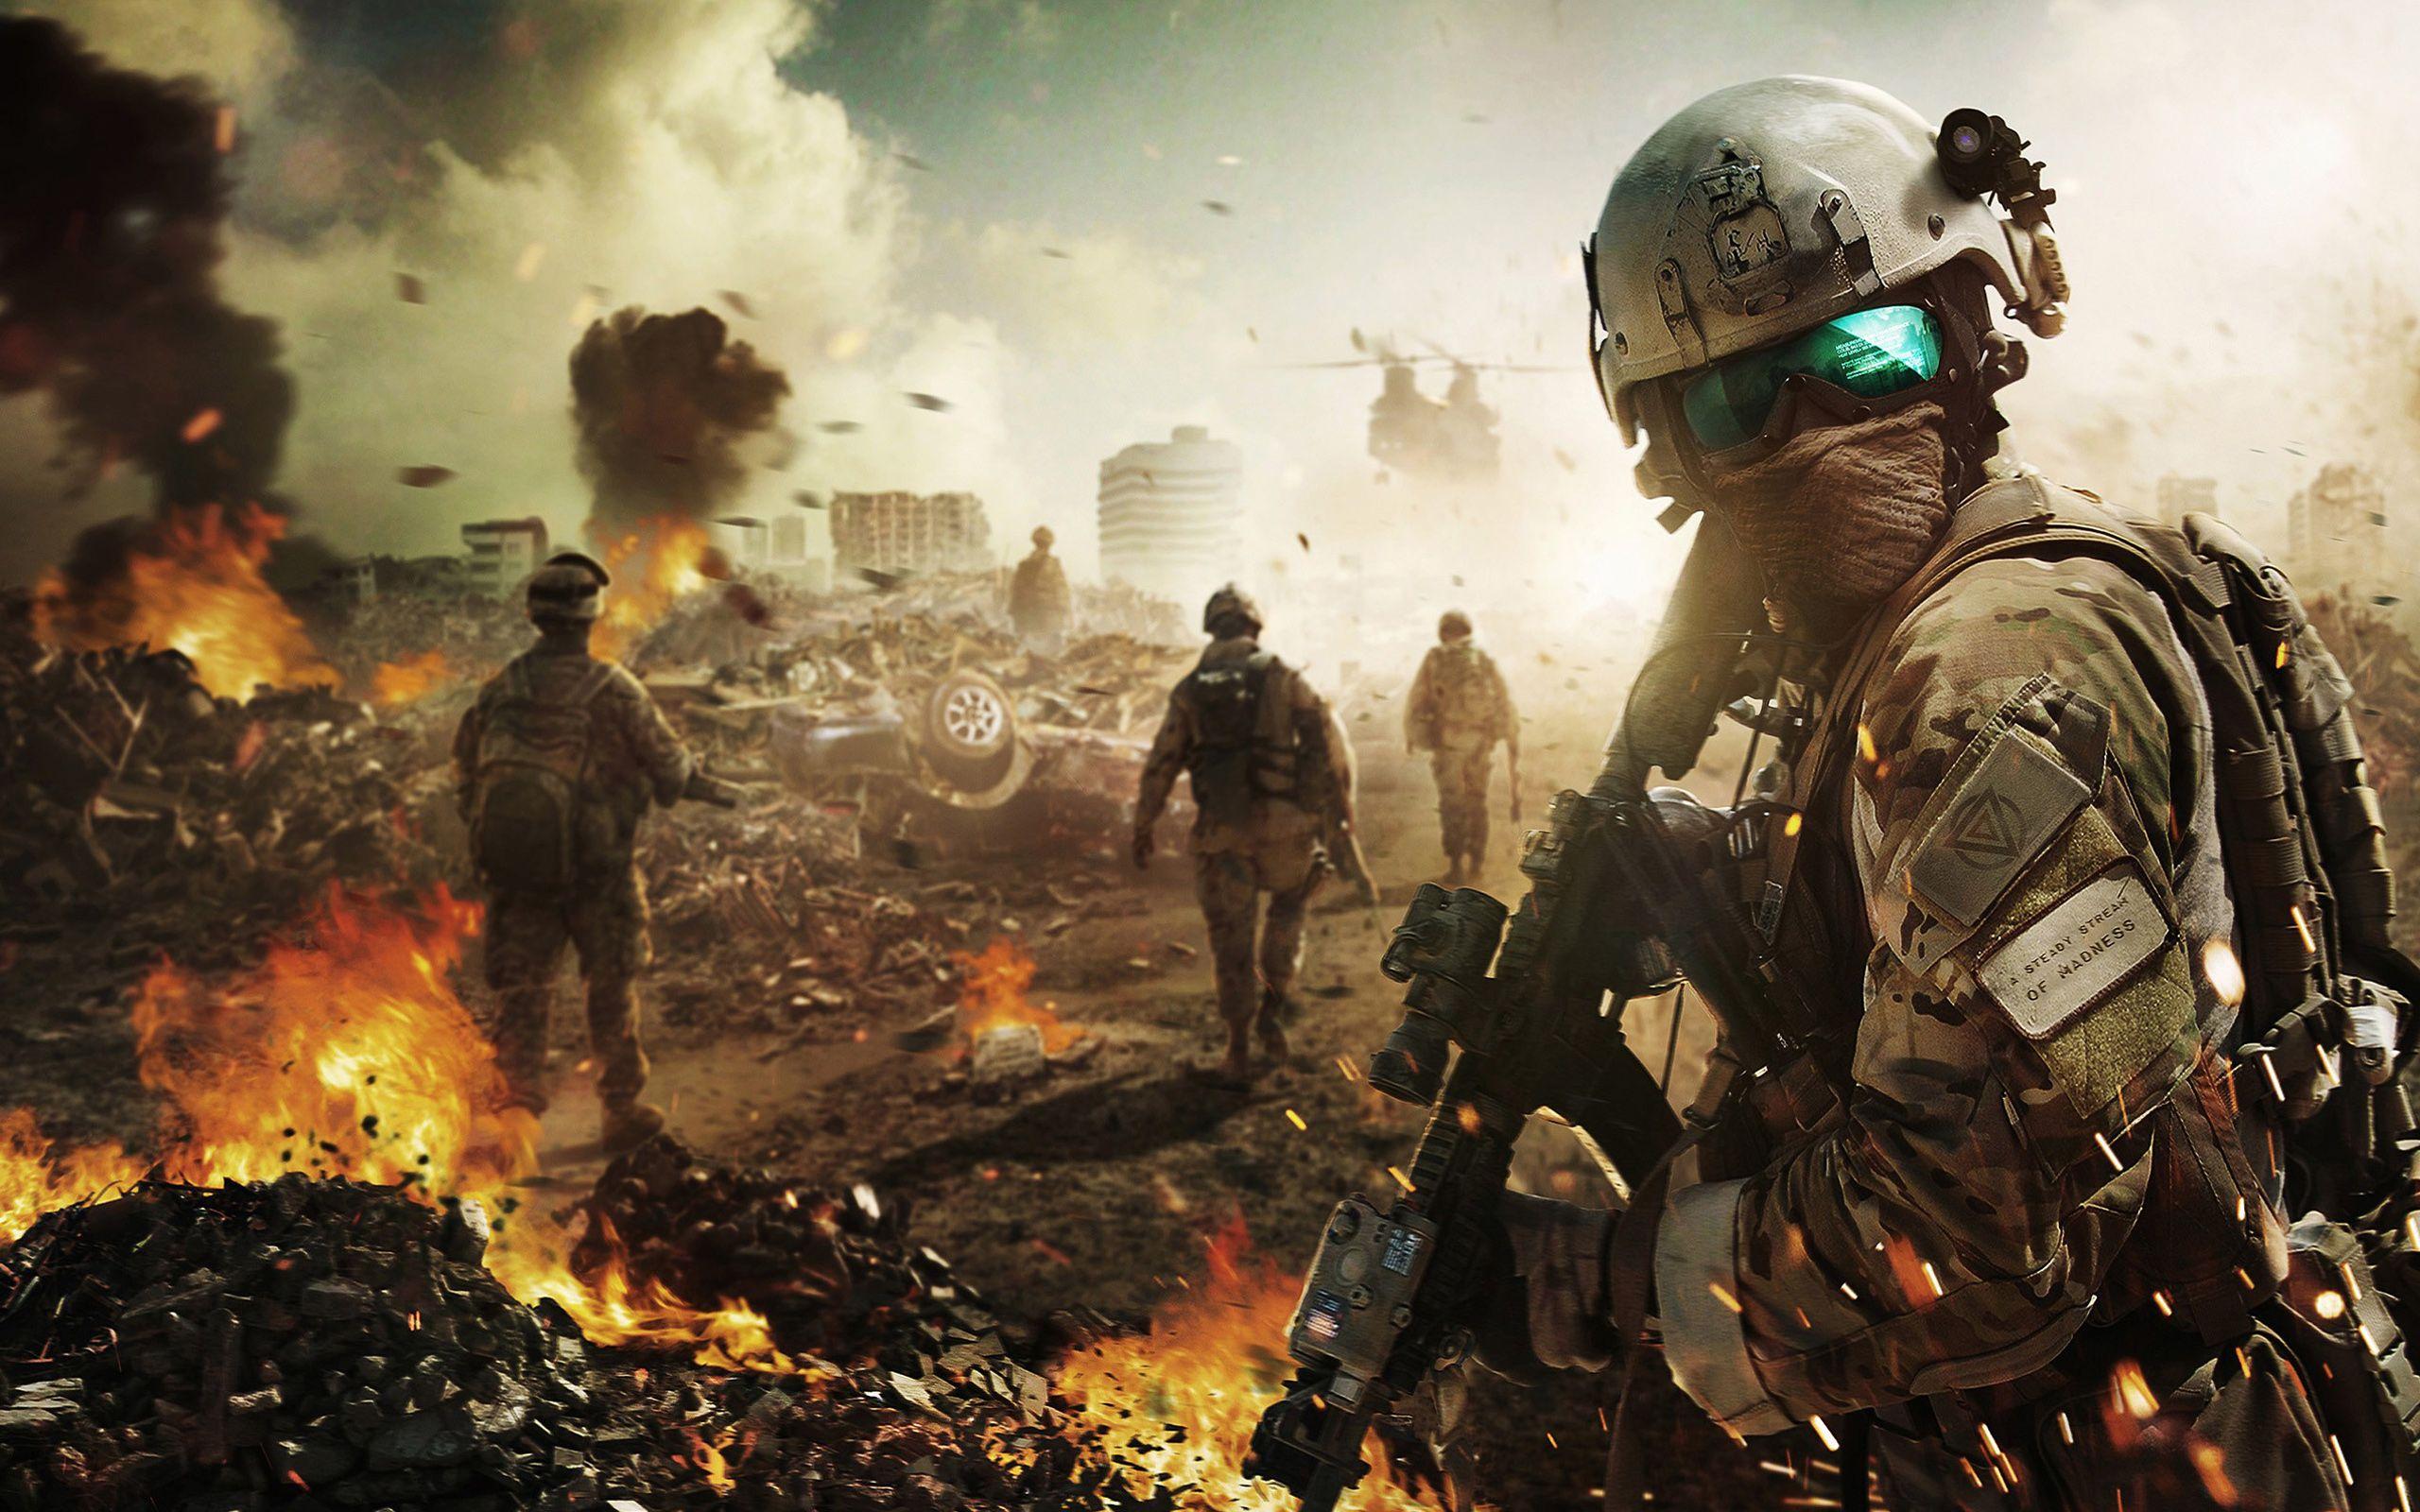 Sci Fi Mech Robot Soldier Mecha Wallpaper 1920x1440 450190 Future Soldier Gaming Wallpapers Battlefield